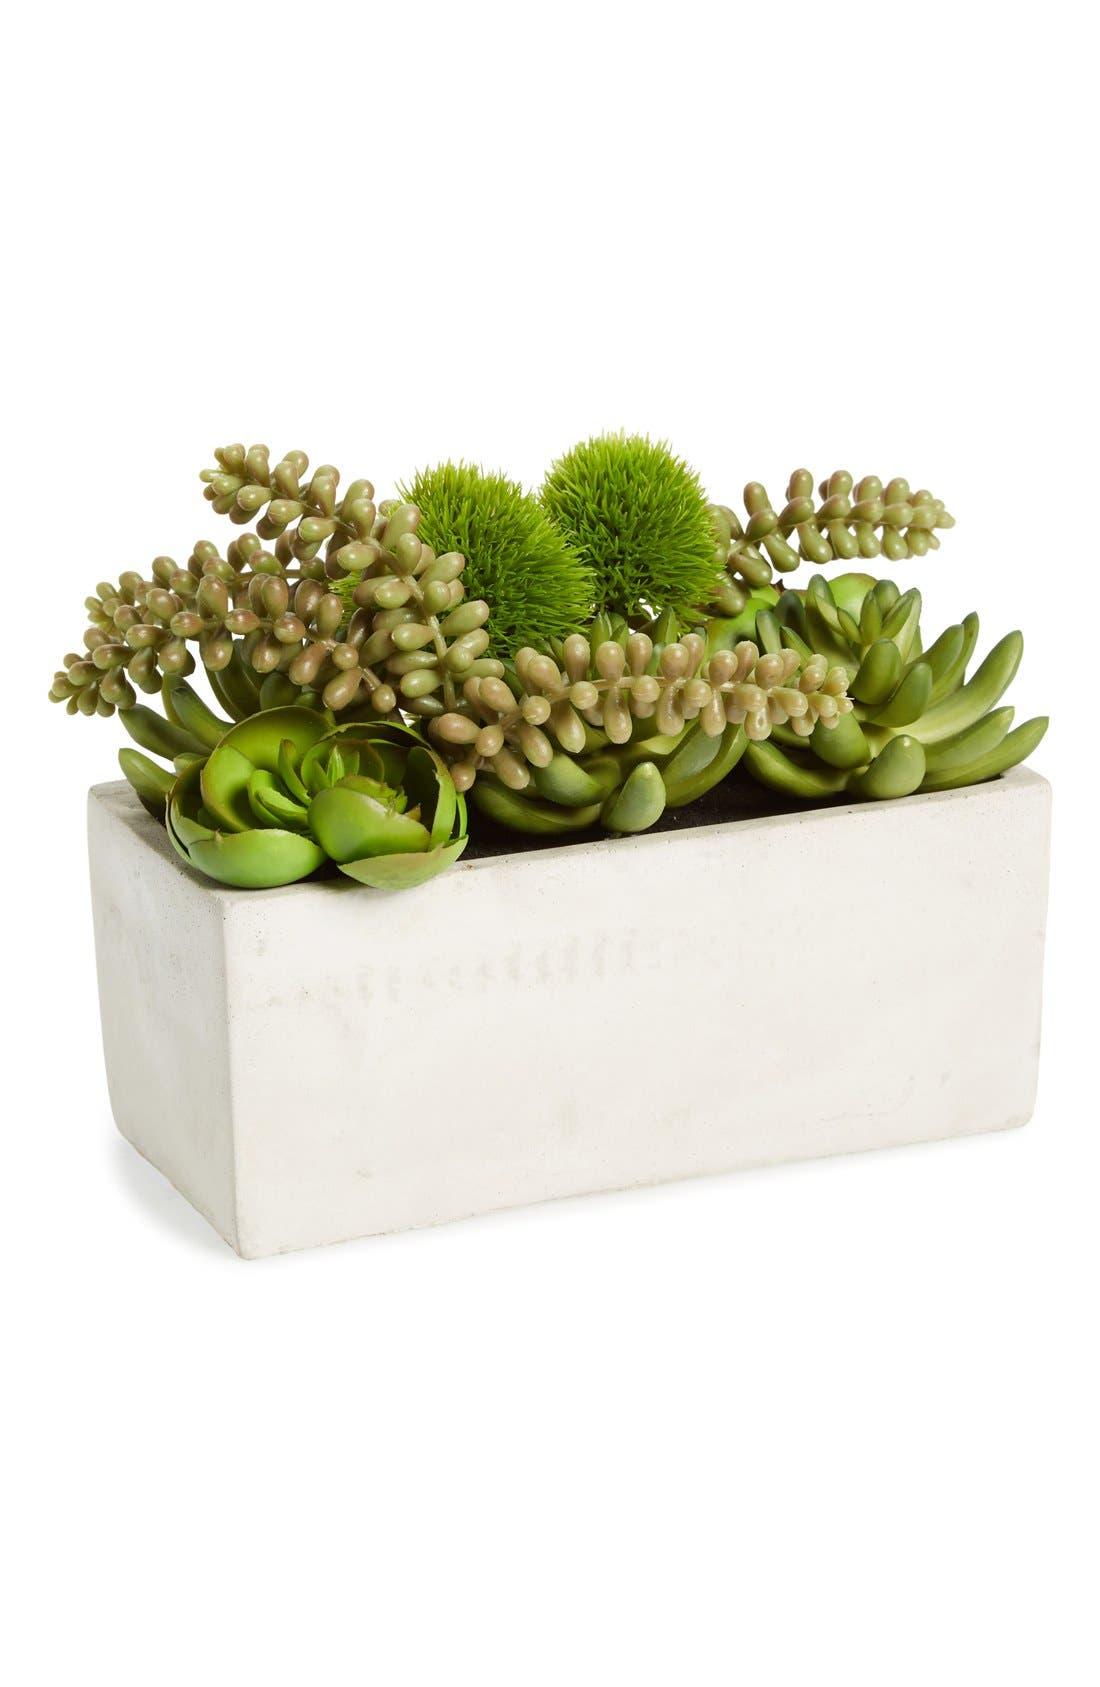 Alternate Image 1 Selected - Sage & Co. Faux Succulent Garden in Cement Pot